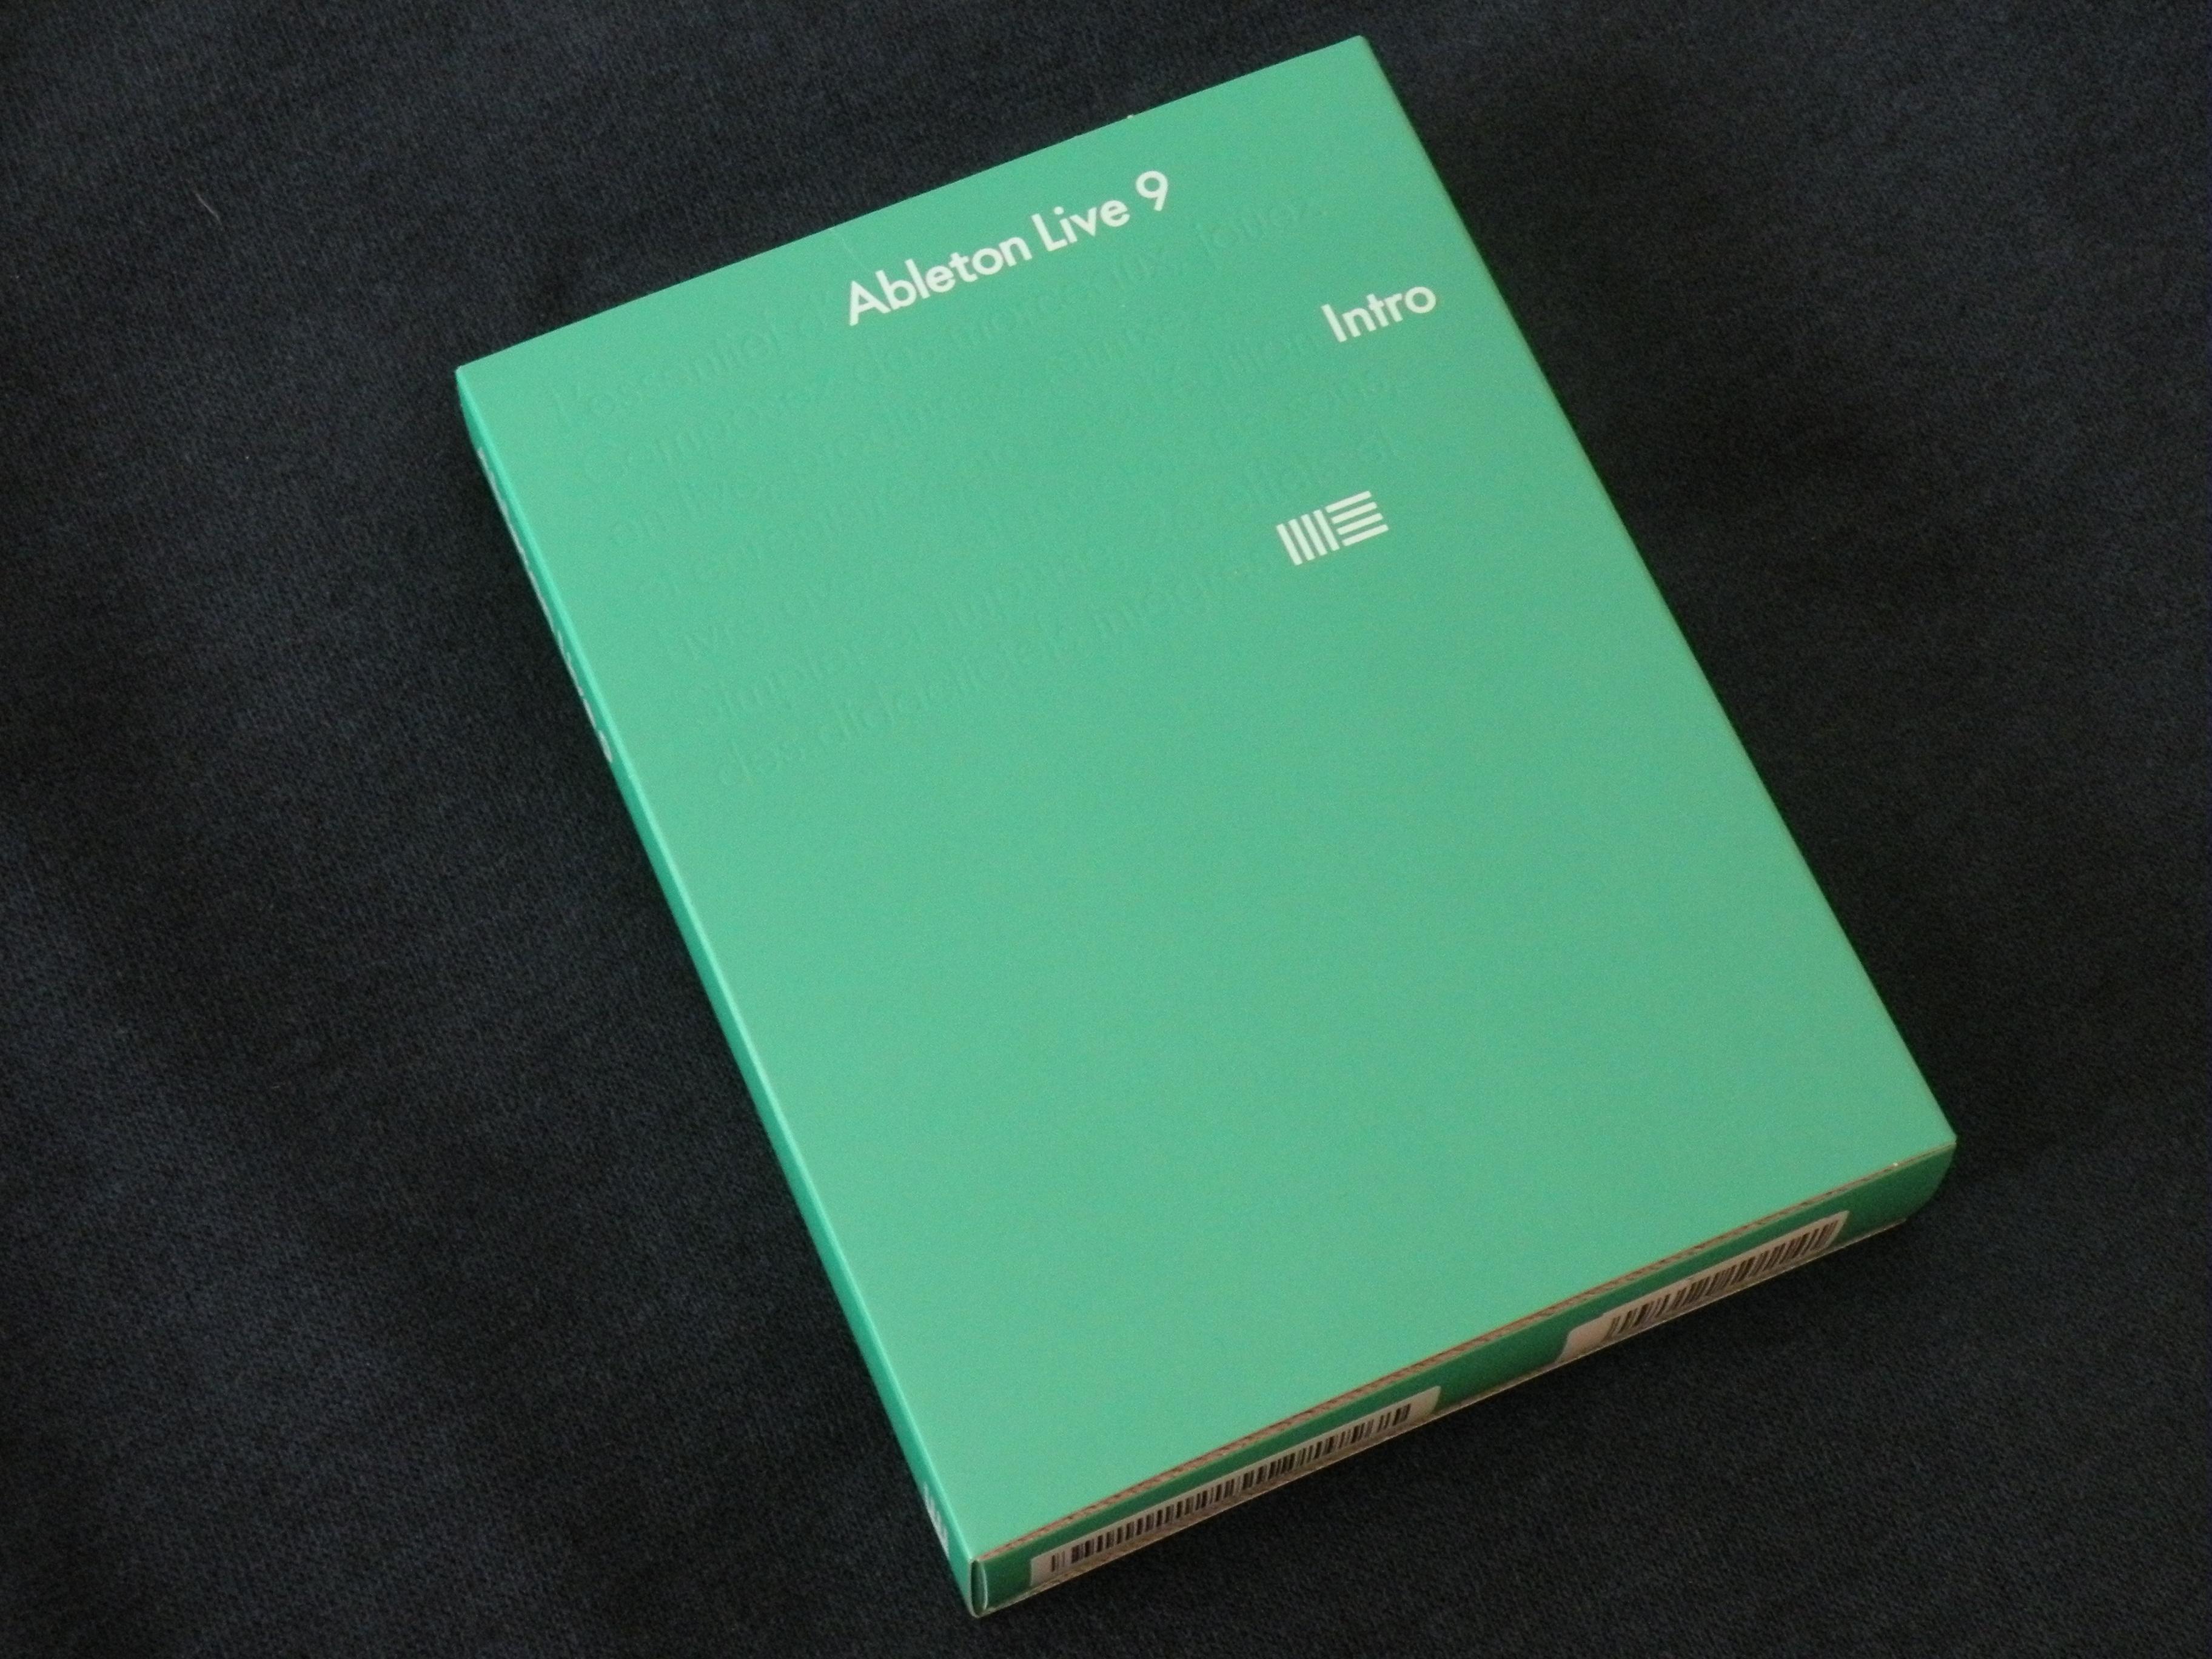 ableton live 9 intro image 929126 audiofanzine. Black Bedroom Furniture Sets. Home Design Ideas